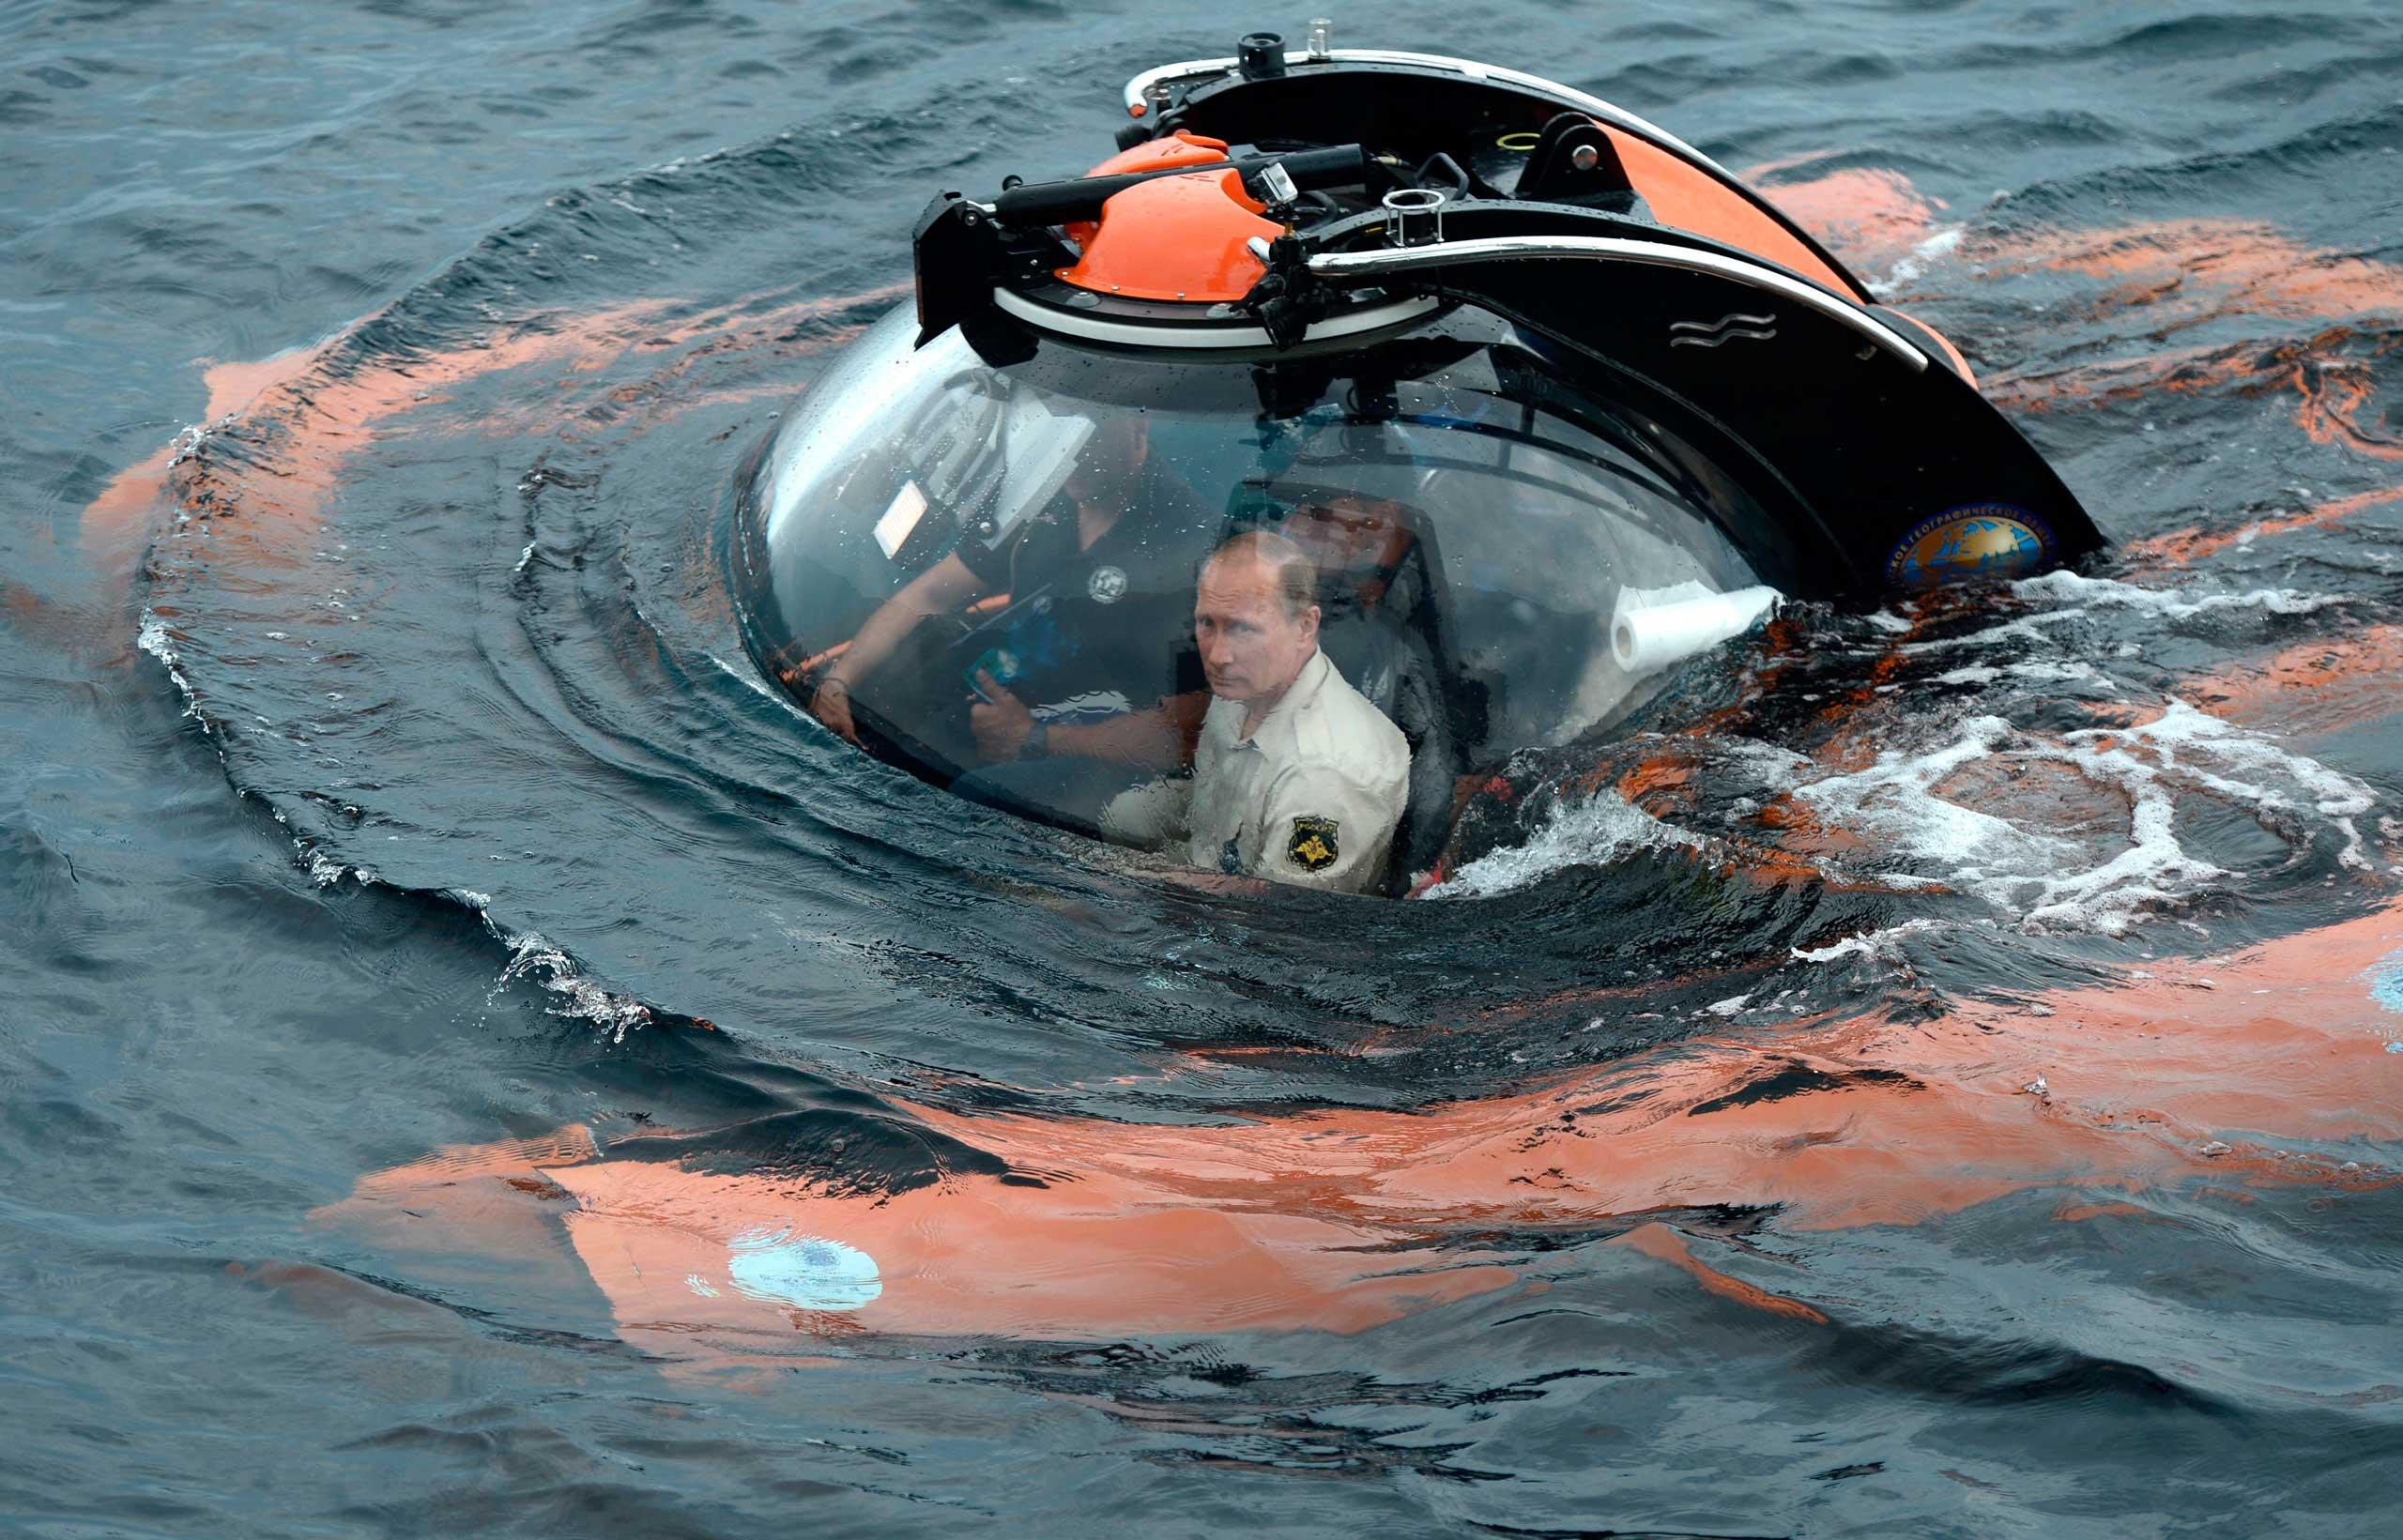 President Vladimir Putin sits on board a bathyscaphe as it plunges into the Black sea along the coast of Sevastopol, Crimea, on Aug. 18, 2015.